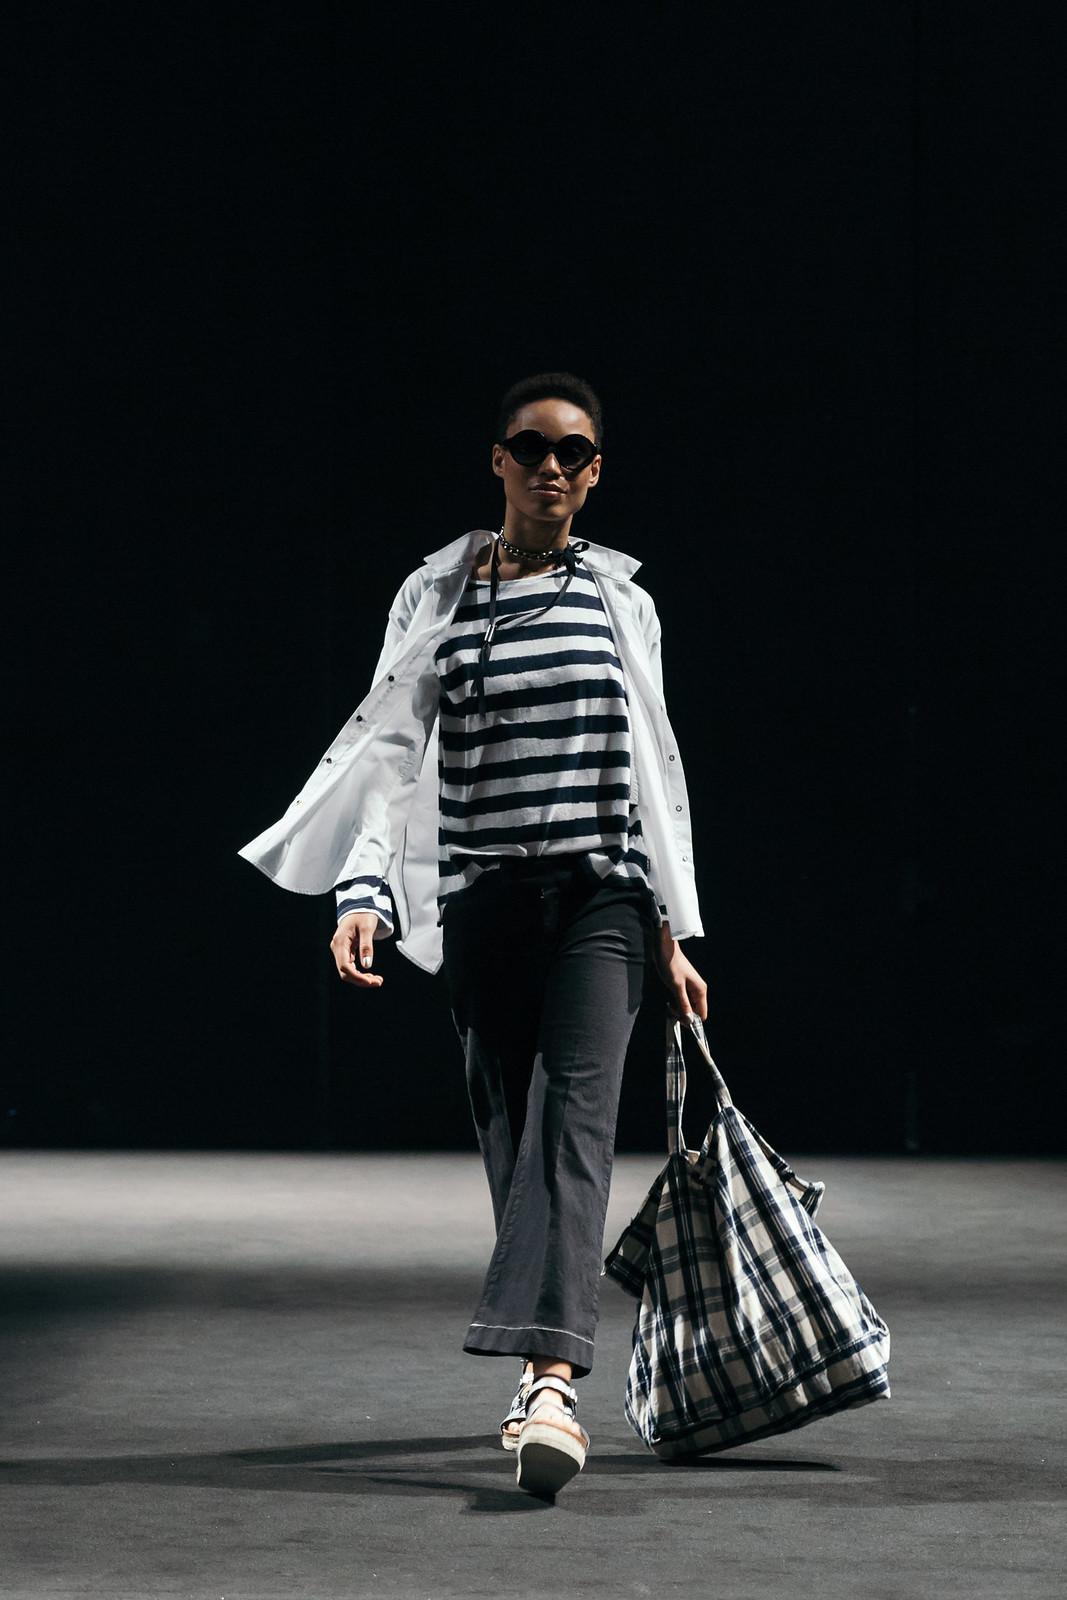 Jessie Chanes - Seams for a desire - 080 Bacelona Fashion #080bcnfasion -33